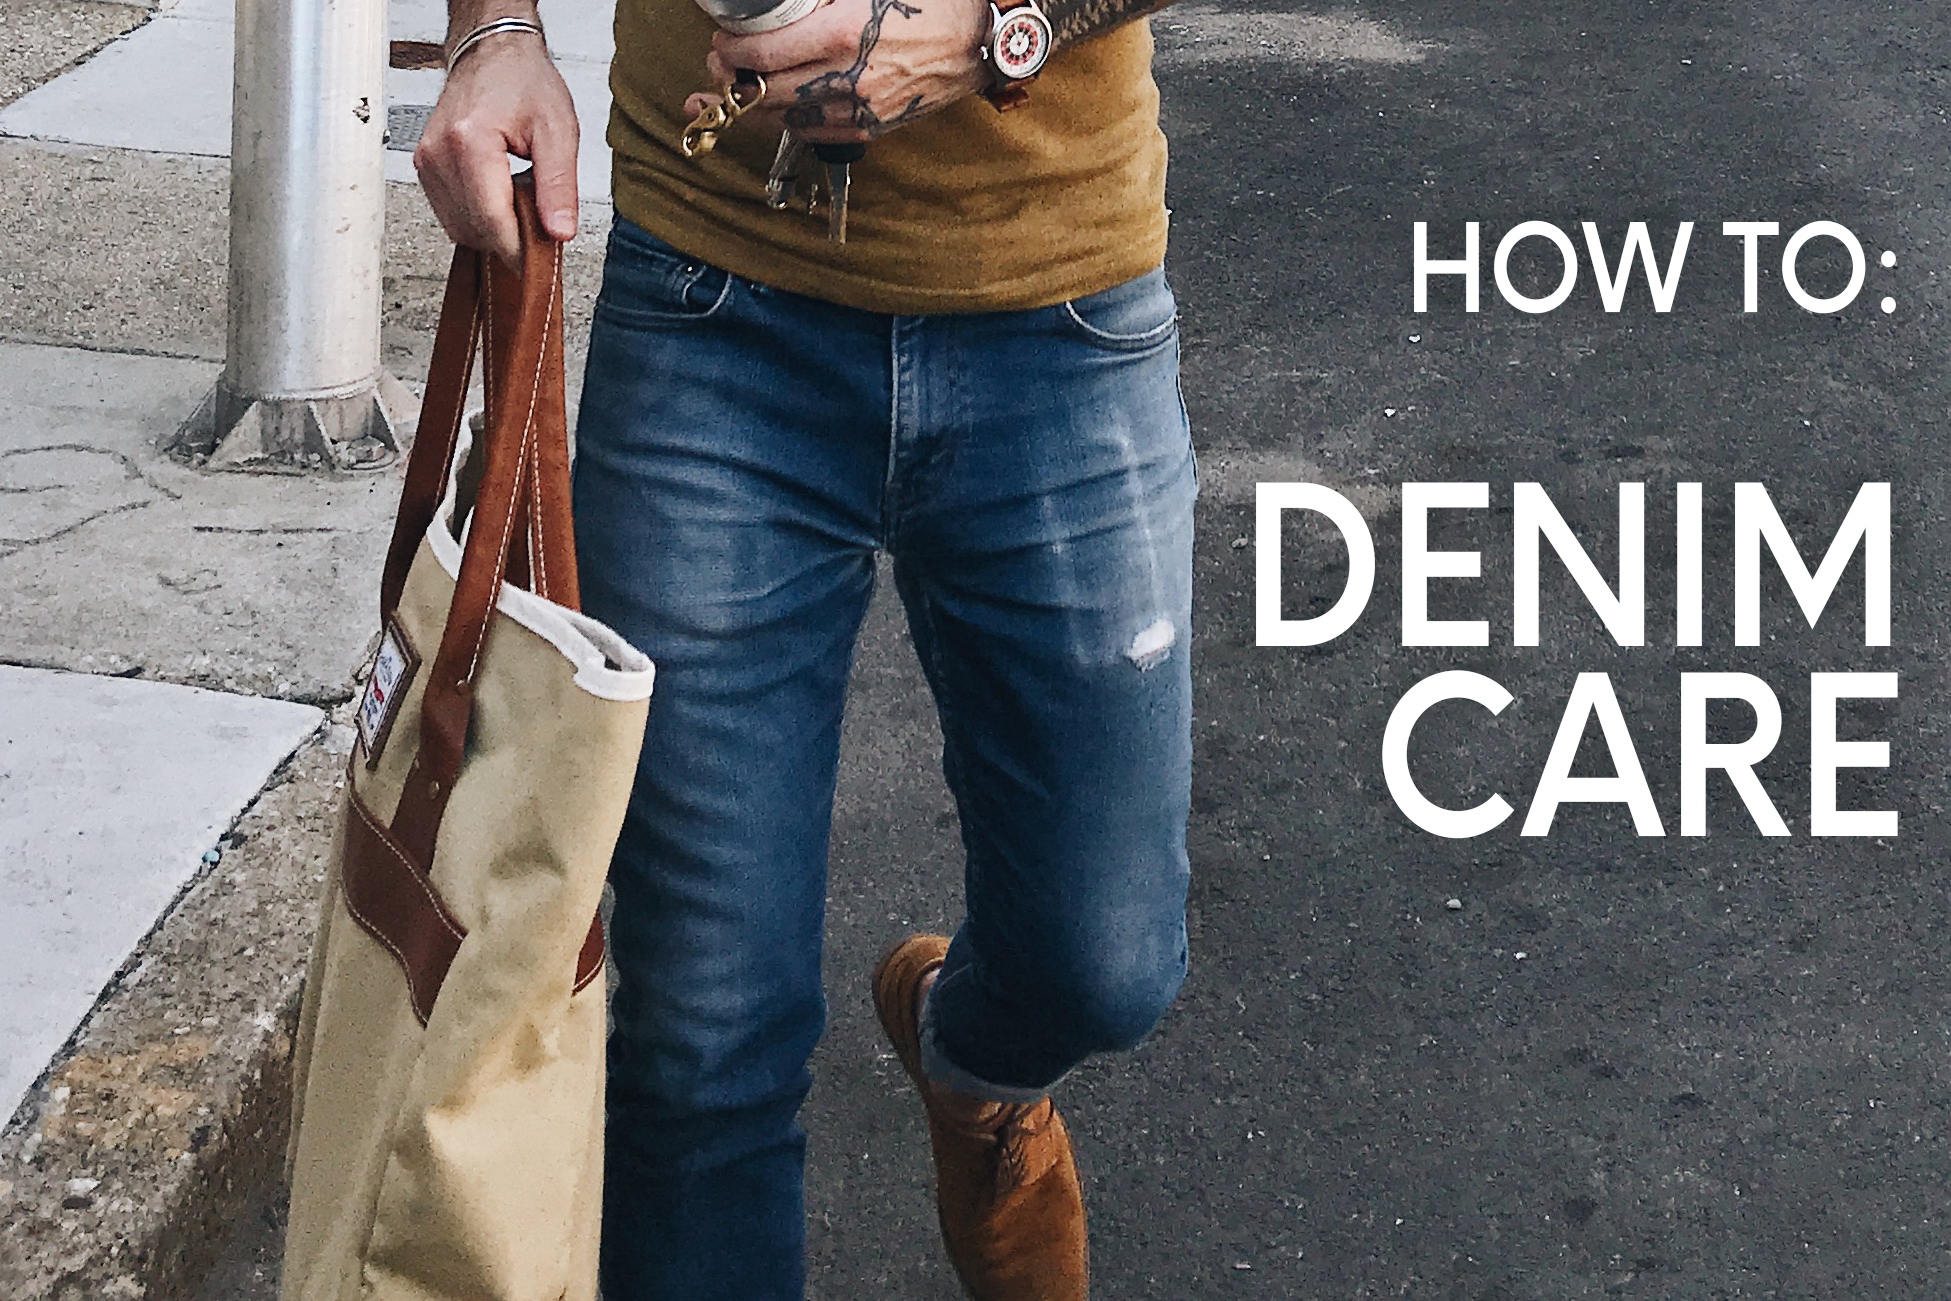 denim_care_how_to.jpg